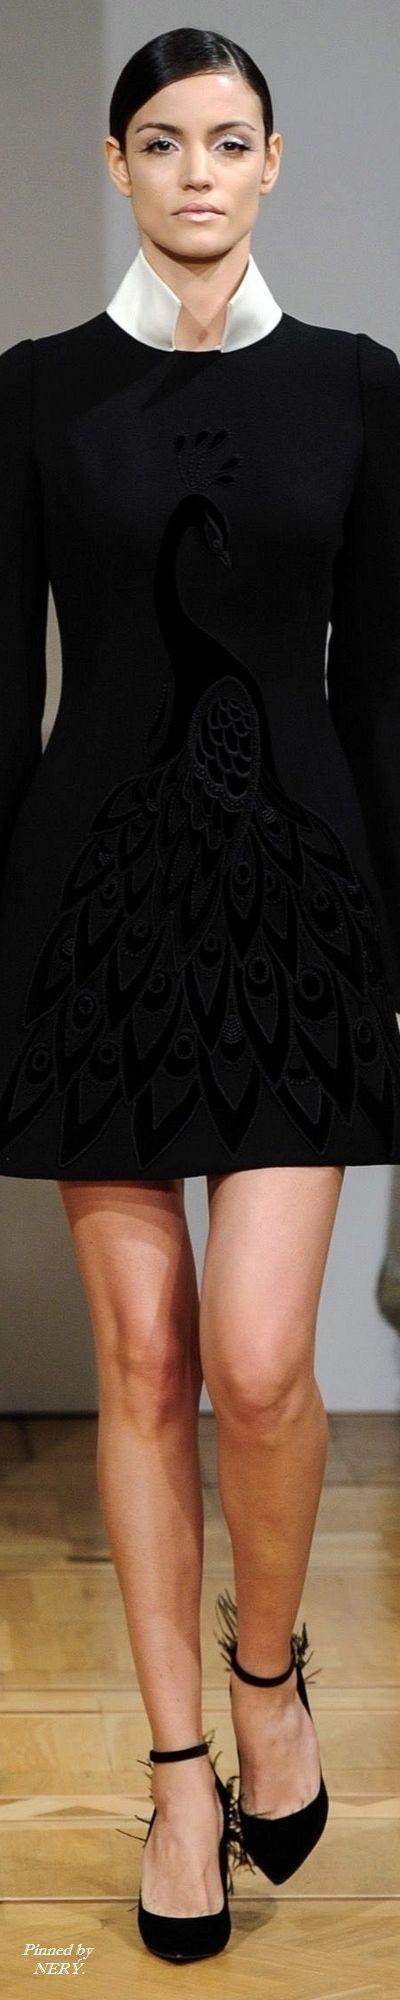 NW ♥ ♥ ♥ Nimrodt Wolfenstein Yulia Yanina Couture Fall-Winter 2016/2017